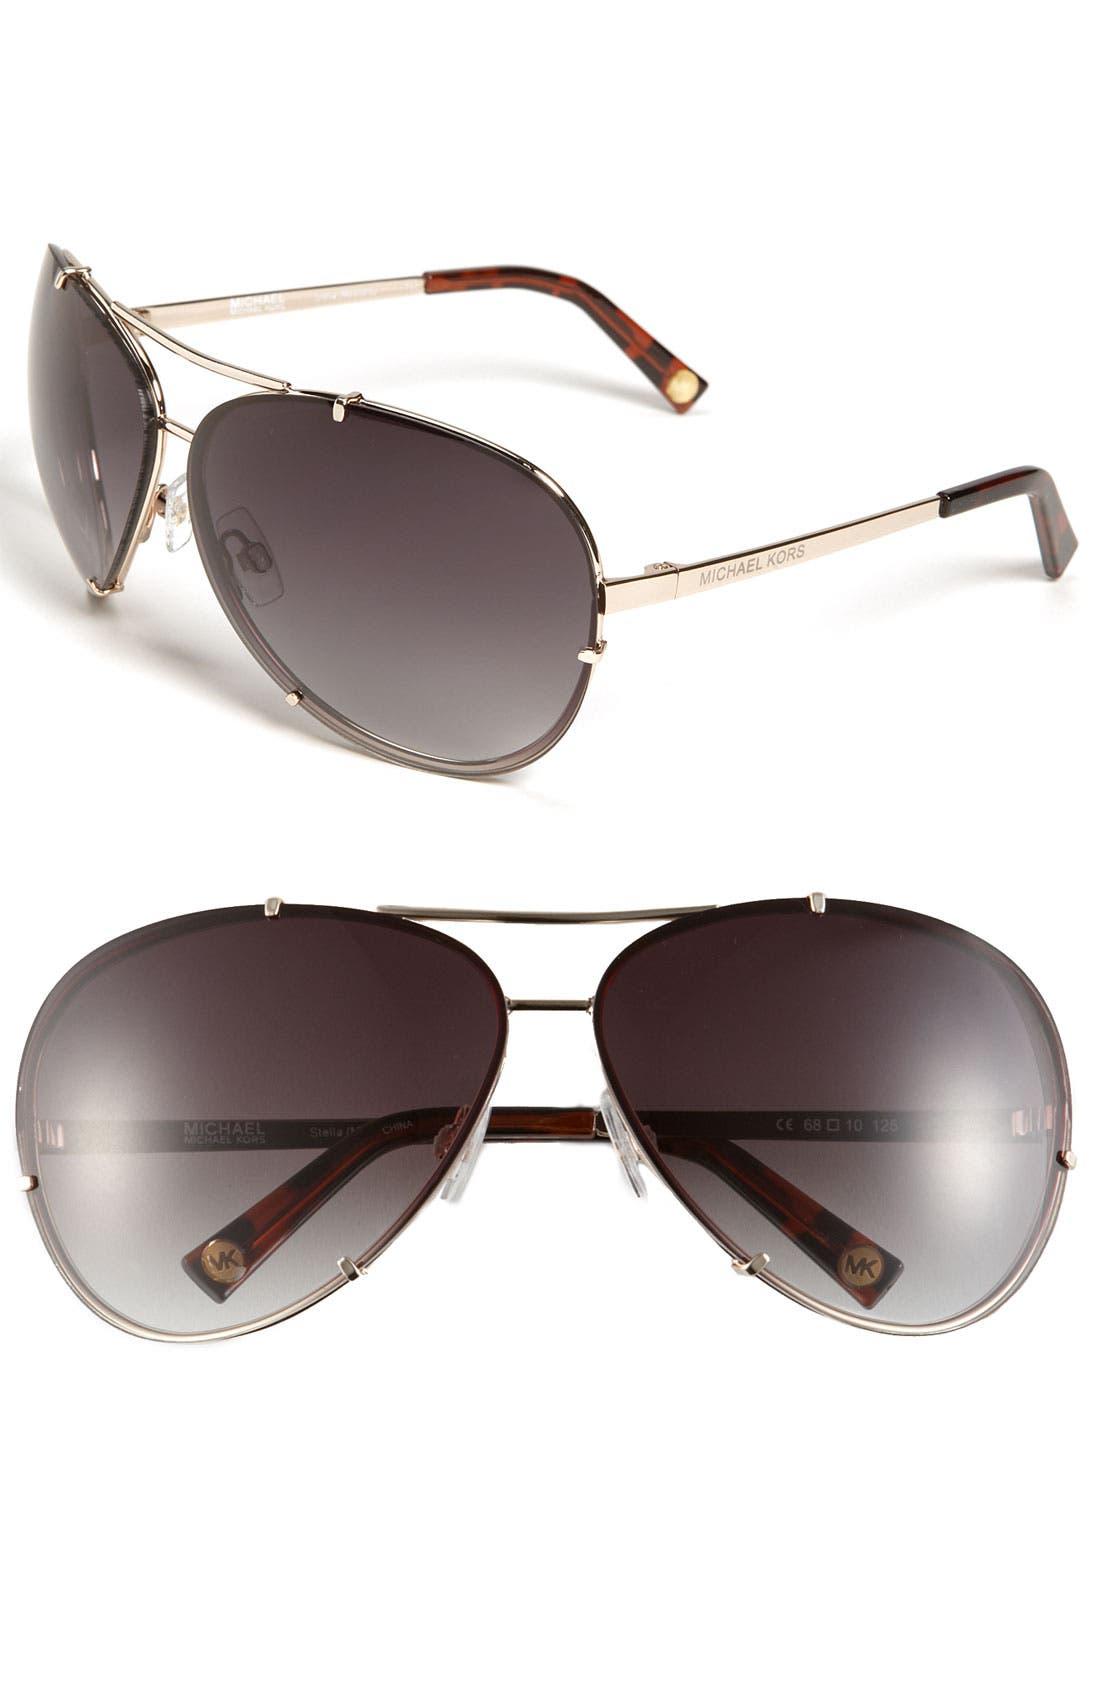 Main Image - MICHAEL Michael Kors 'Stella' 68mm Aviator Sunglasses